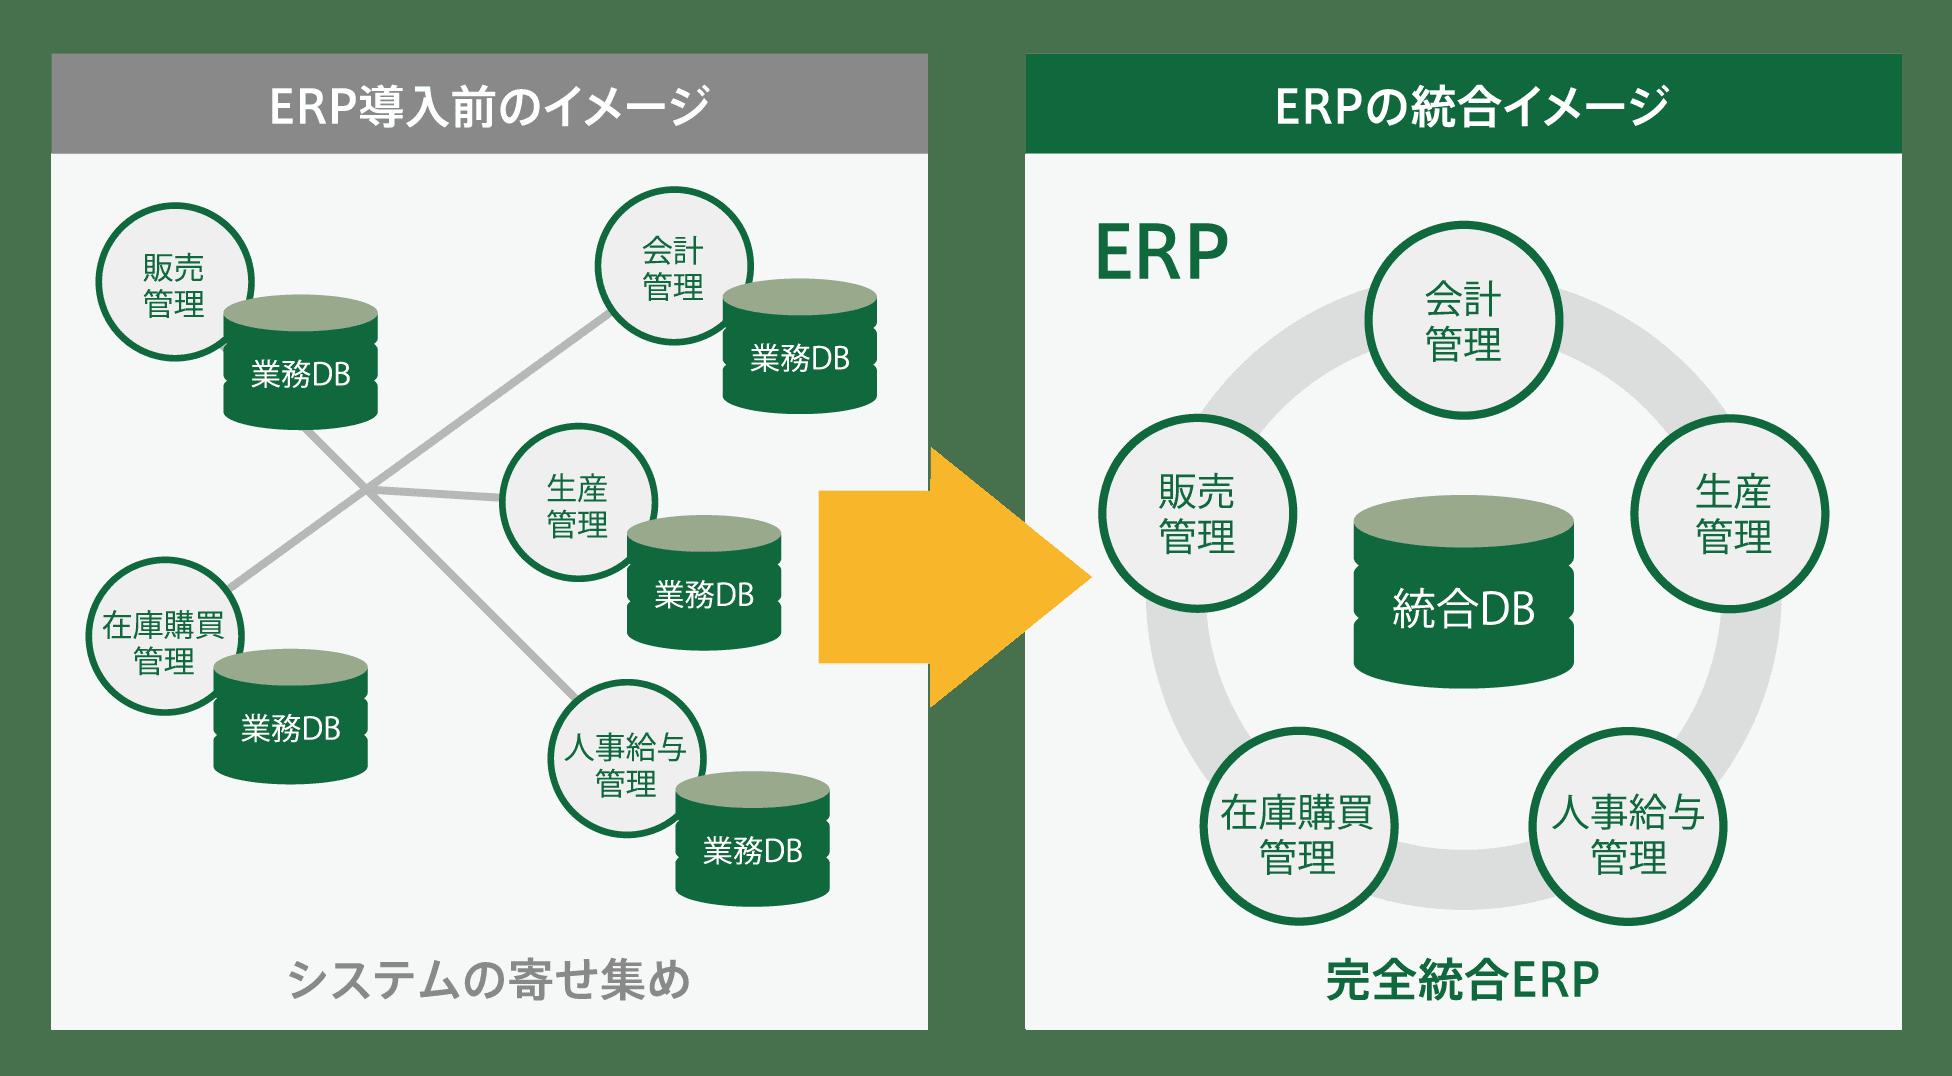 ERPとは?基幹システムとの違いやERPパッケージを解説【GRANDIT】